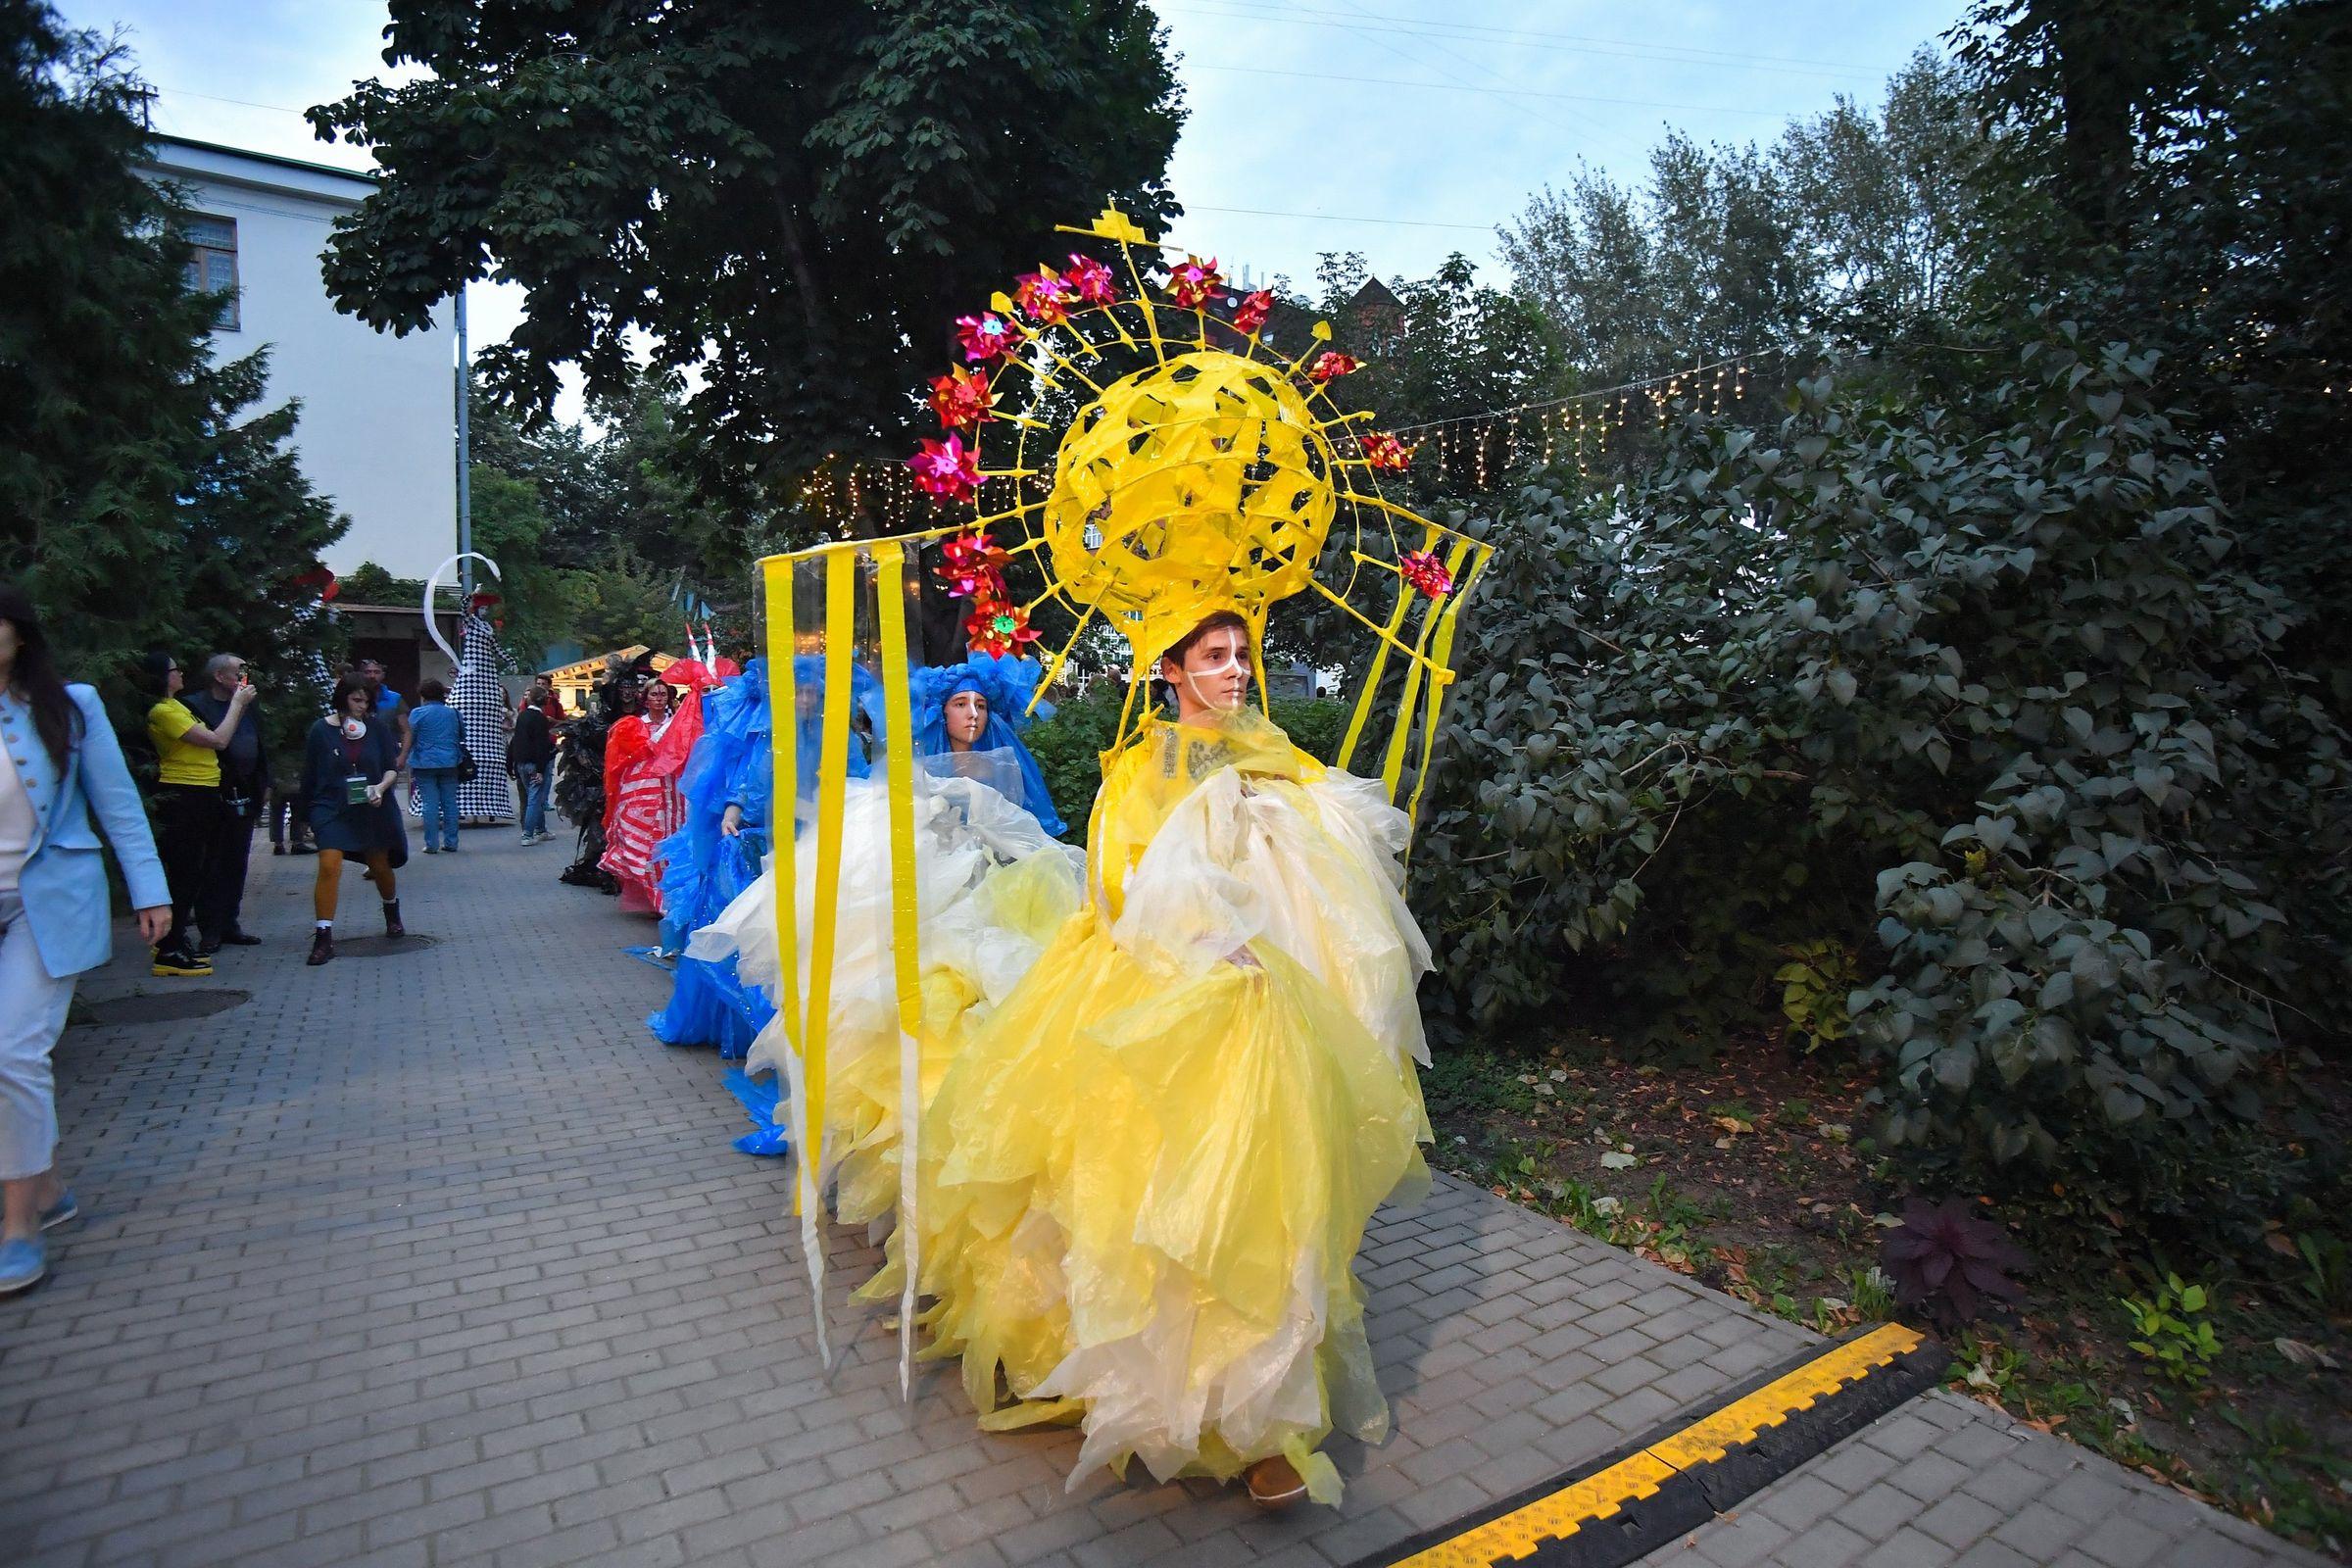 "<p>Фестиваль ""Все в сад!"". Фото © Агентство ""Москва"" / Сергей Киселев</p>"